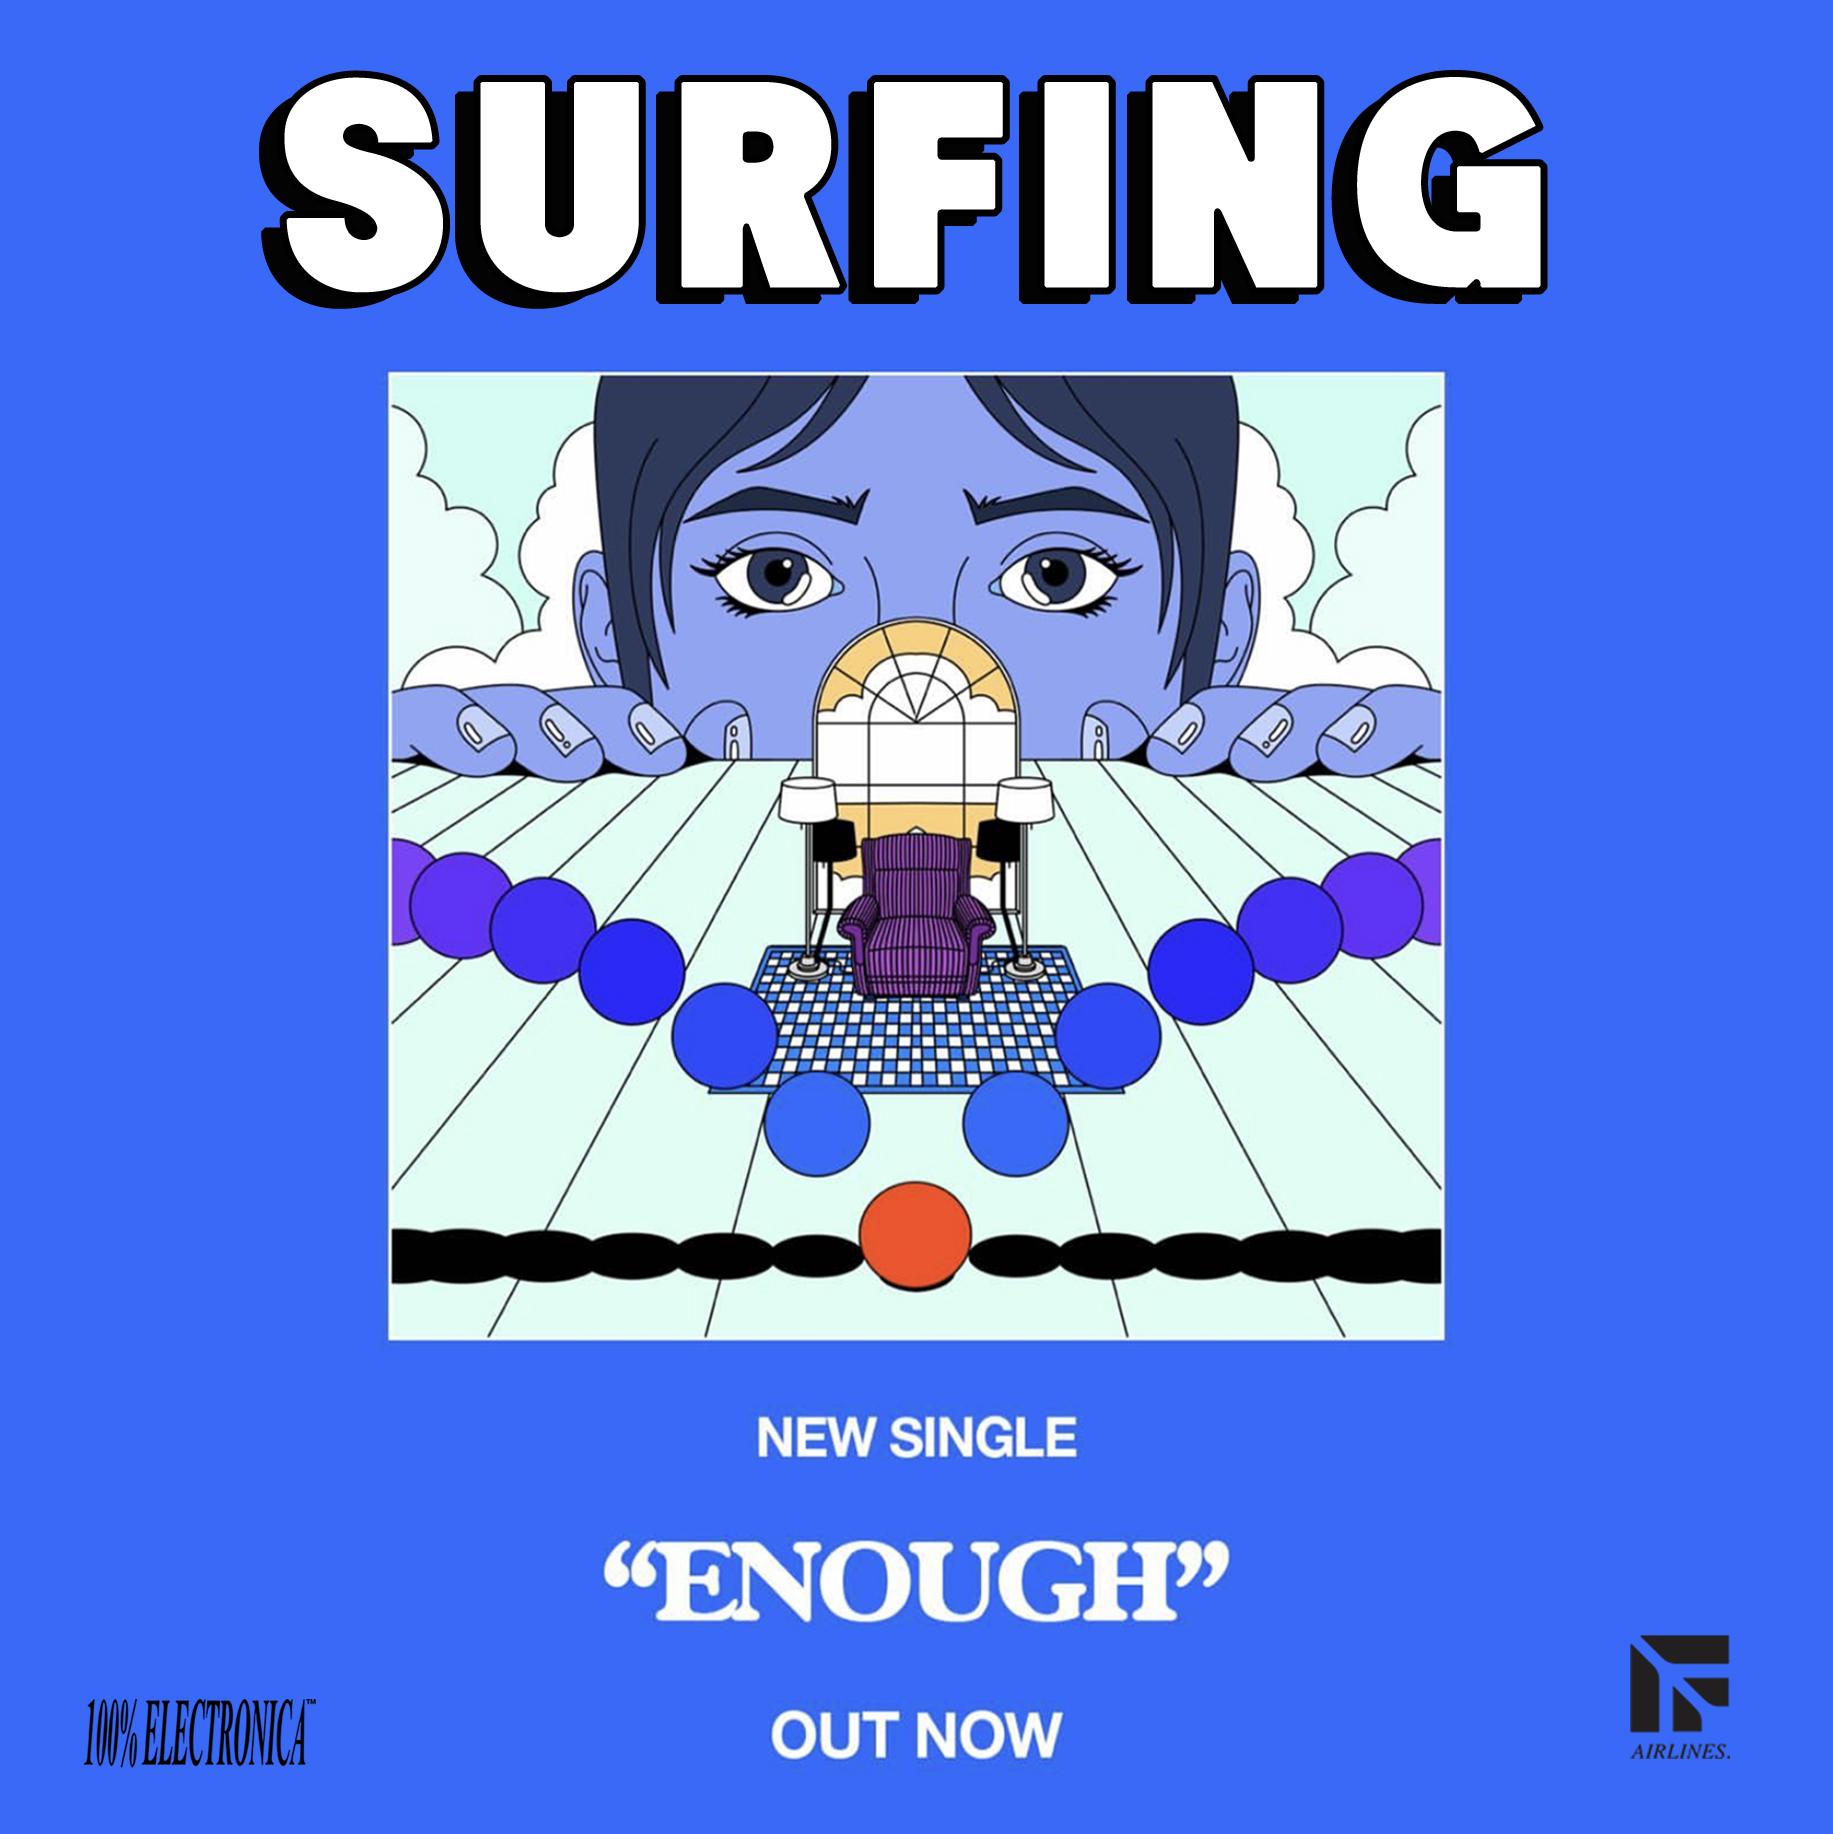 SURFING_ENOUGH.jpg